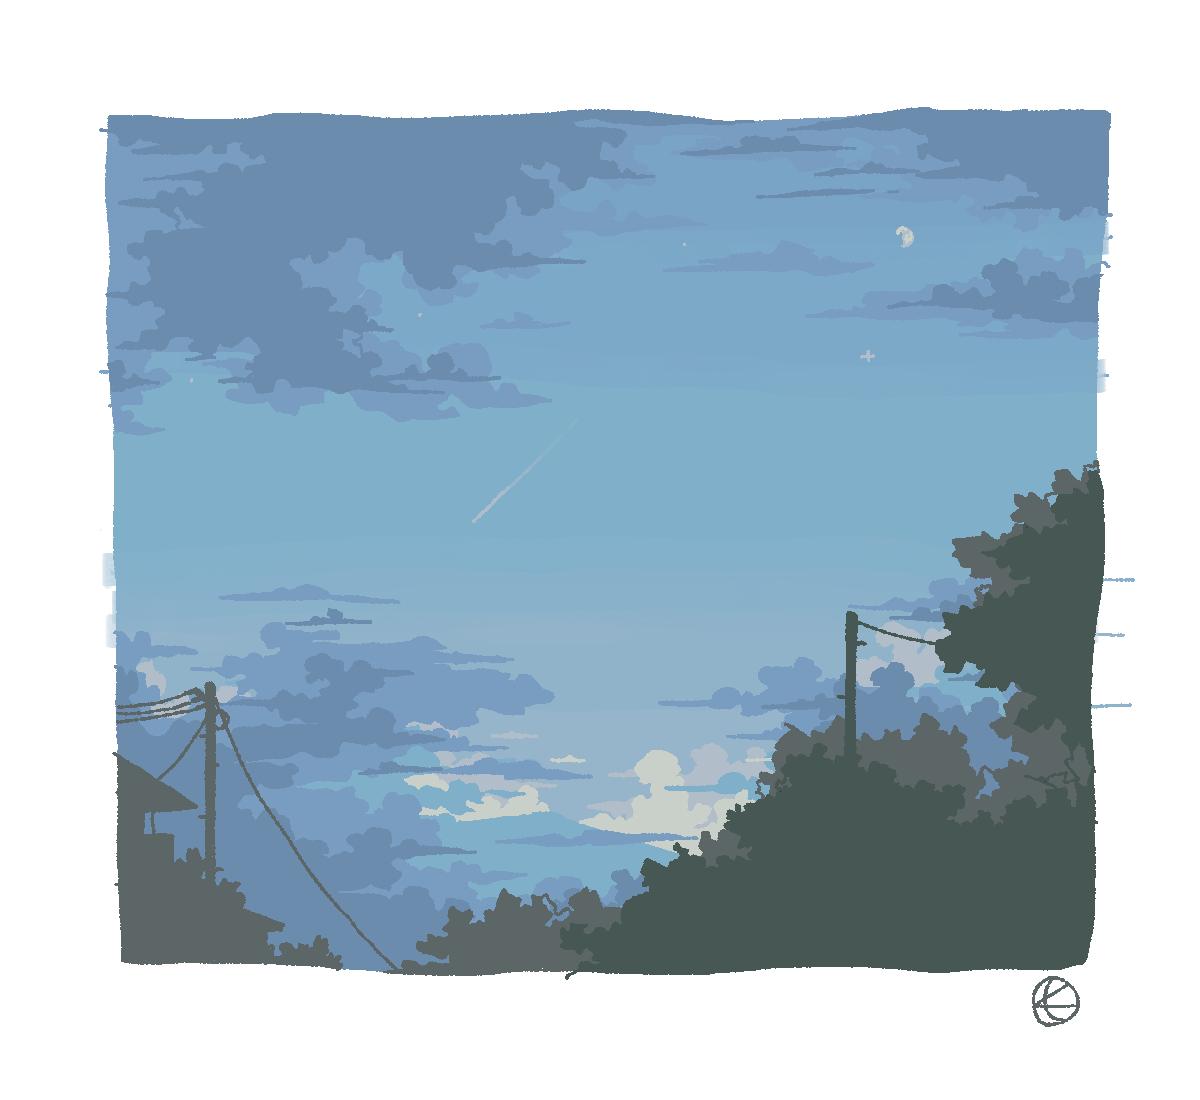 PM 07 : 55